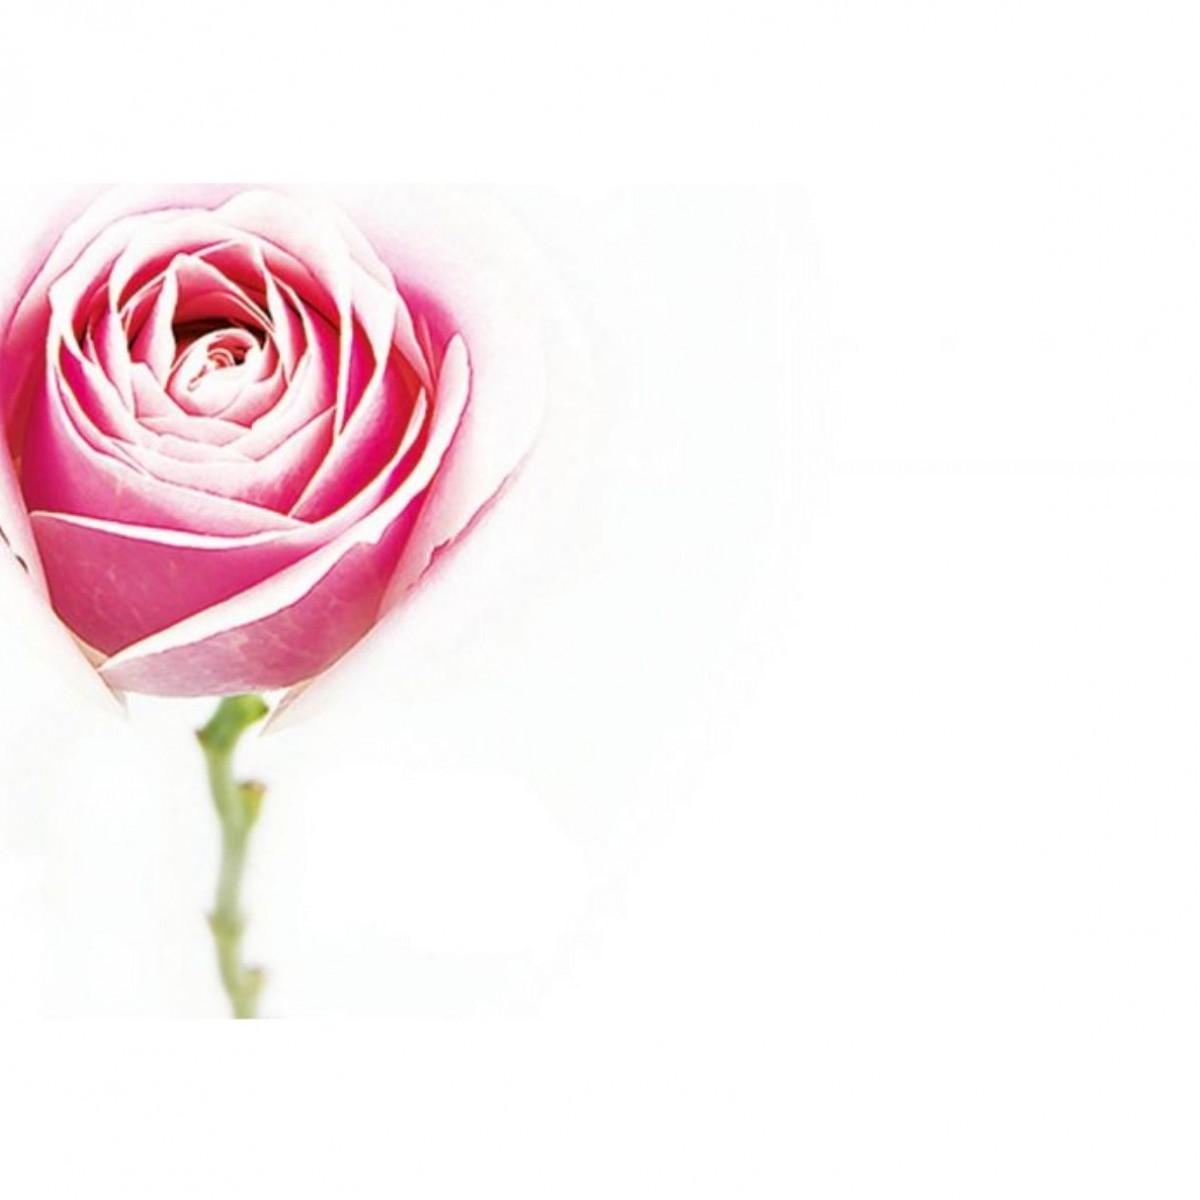 4509 Rose Pink 9x6cm 50x1 Cards